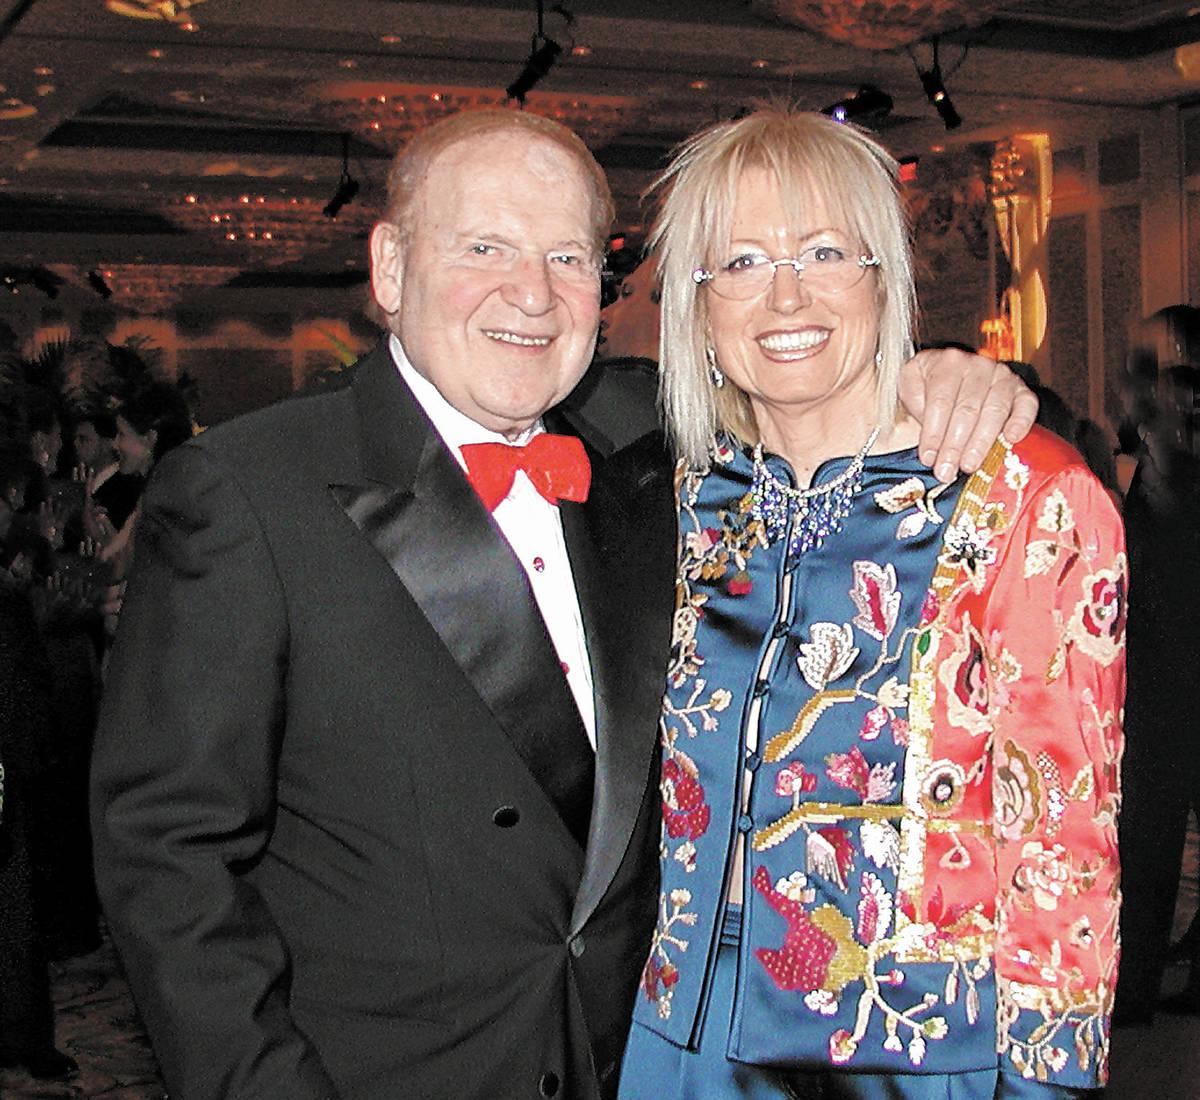 Miriam Adelson named executor of late husband Sheldon Adelson's estate